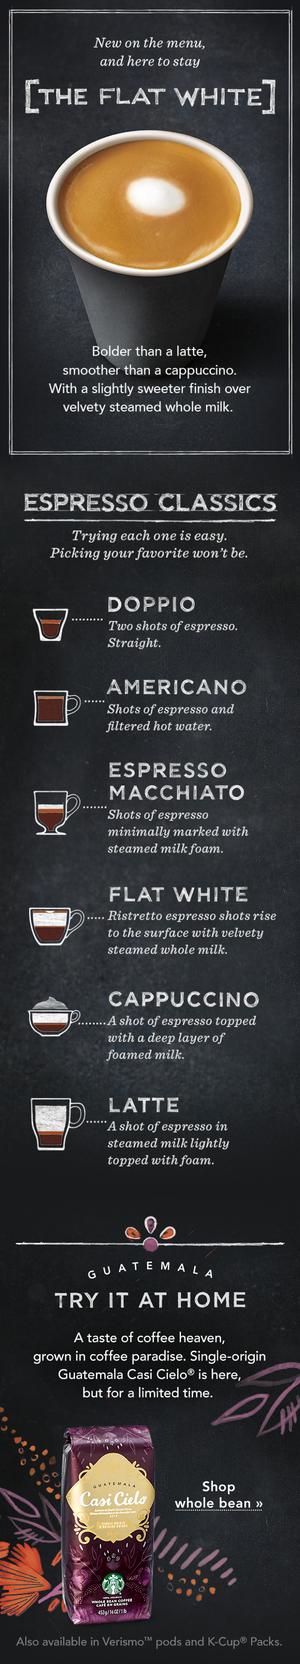 Starbucks Espresso Infographic Advertising